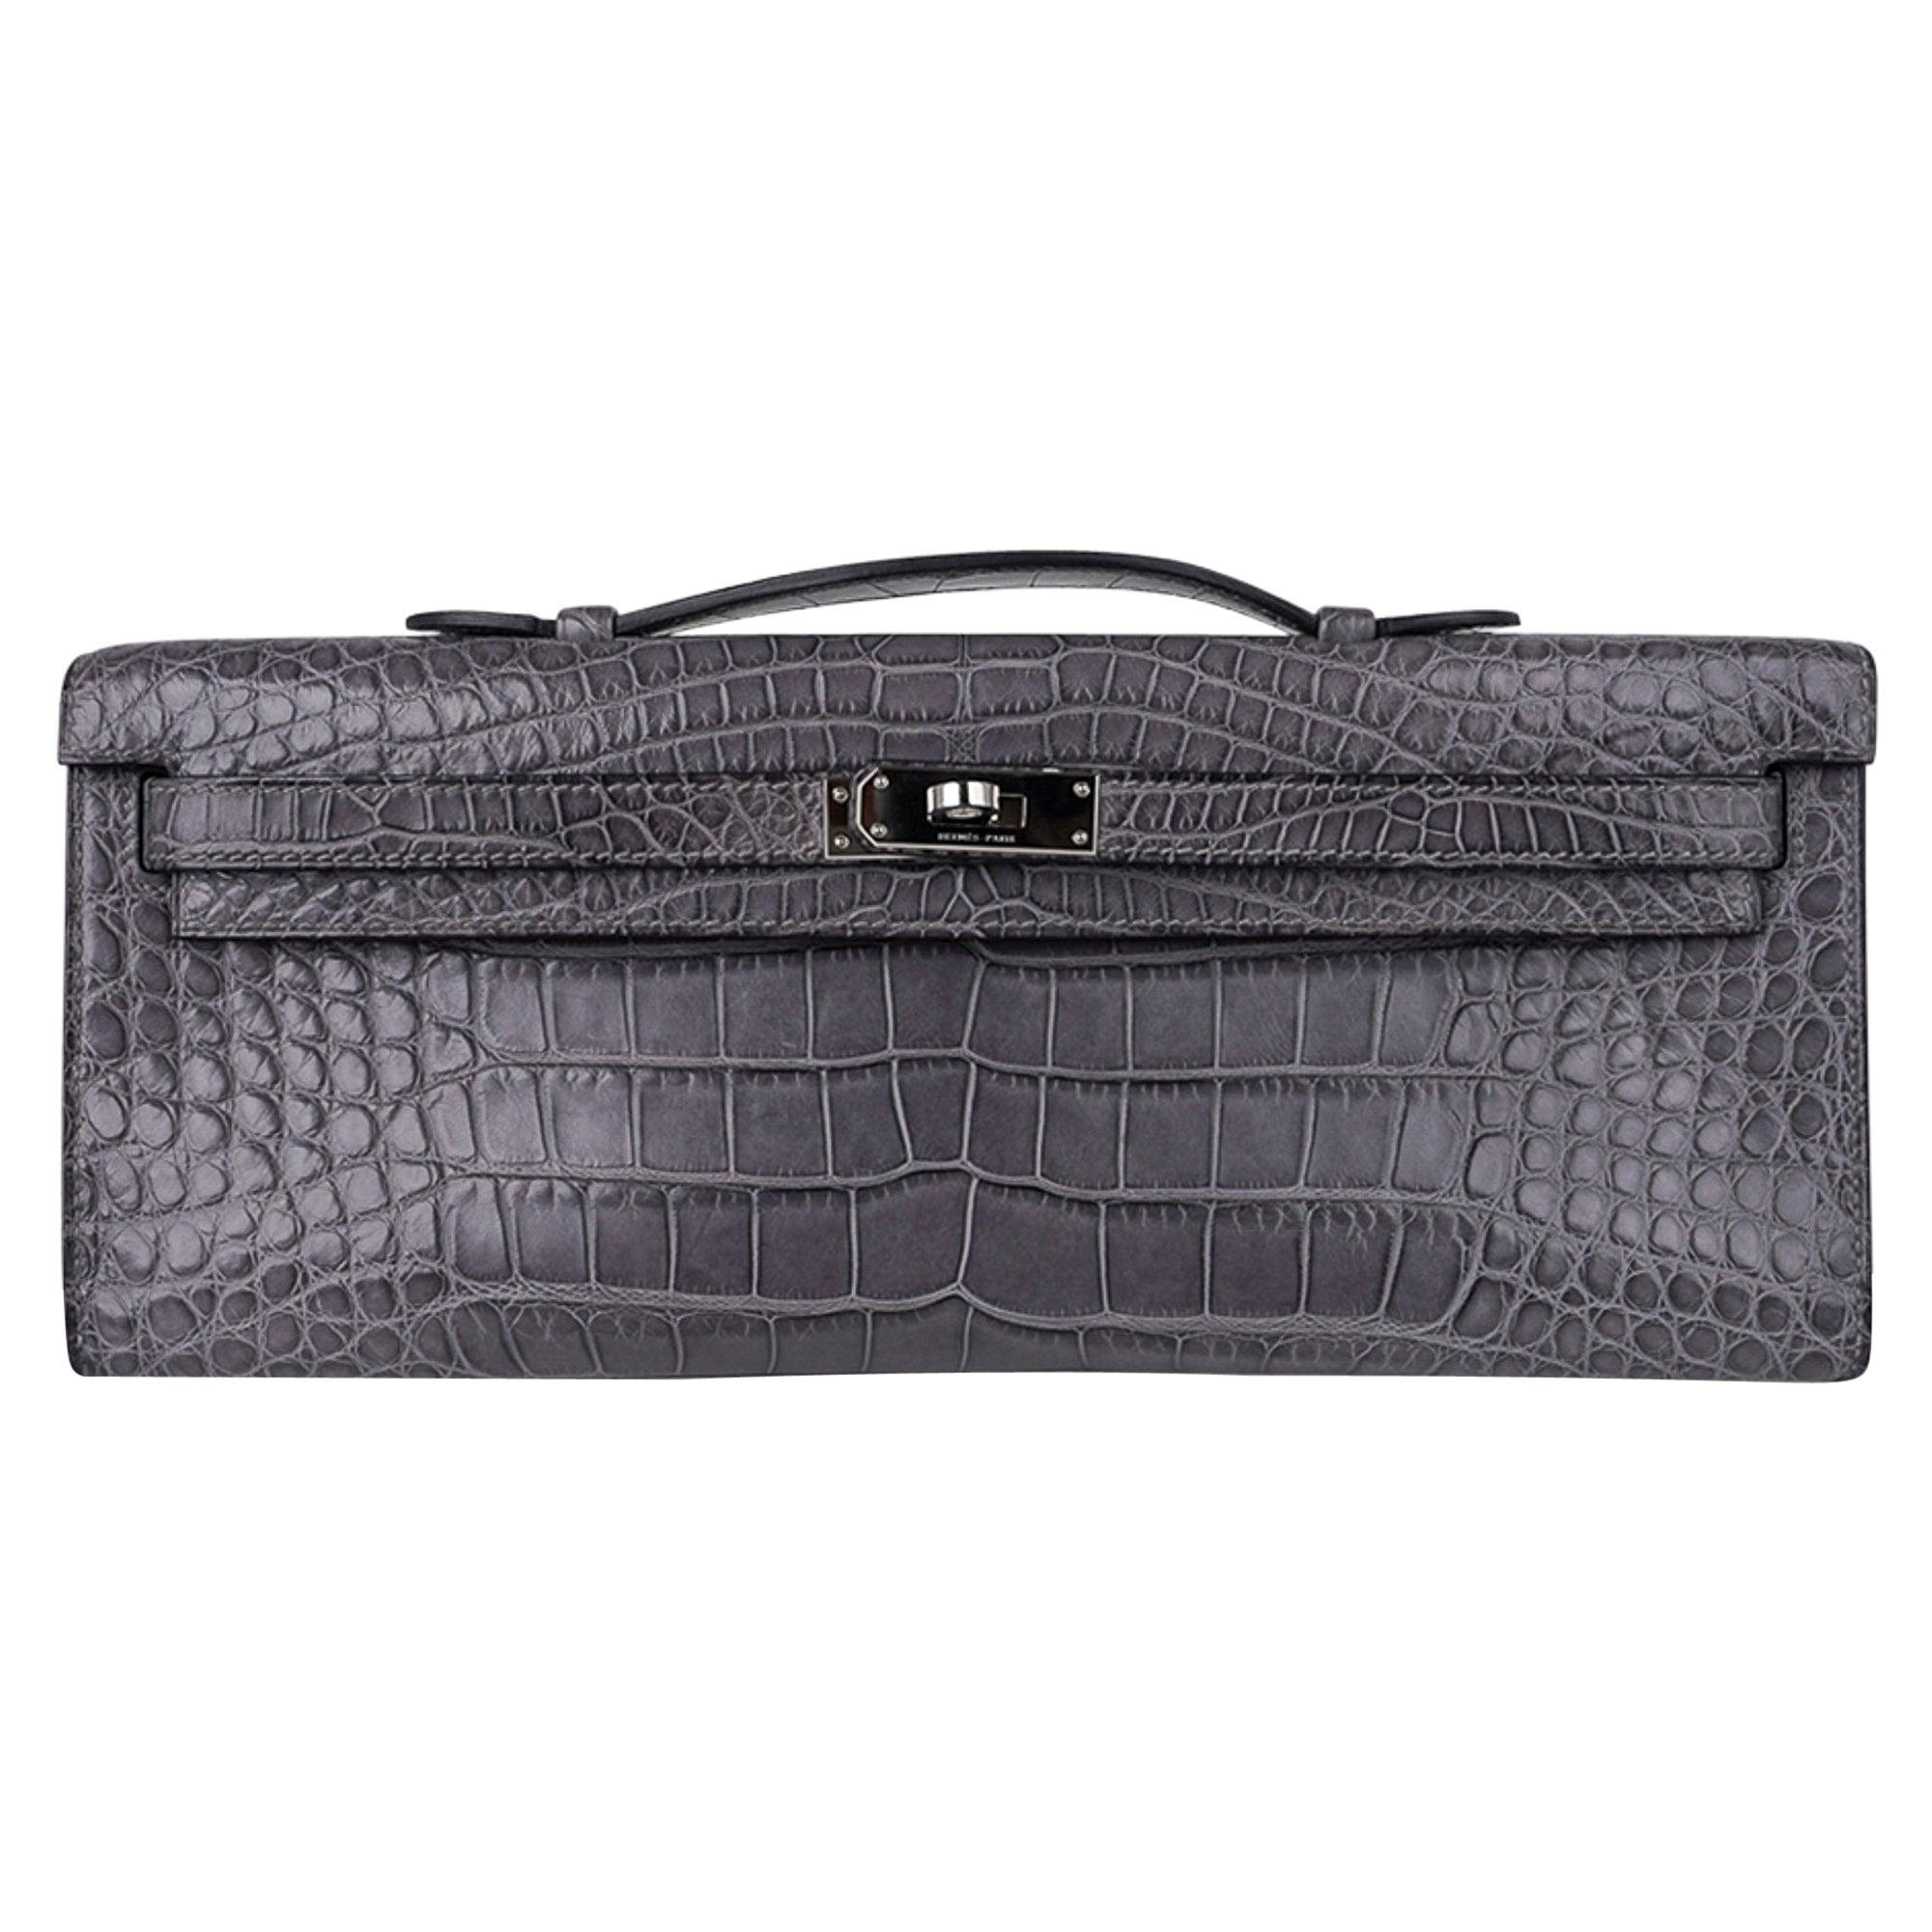 Hermes Kelly Cut Gris Paris Grey Matte Alligator Palladium Hardware Clutch Bag